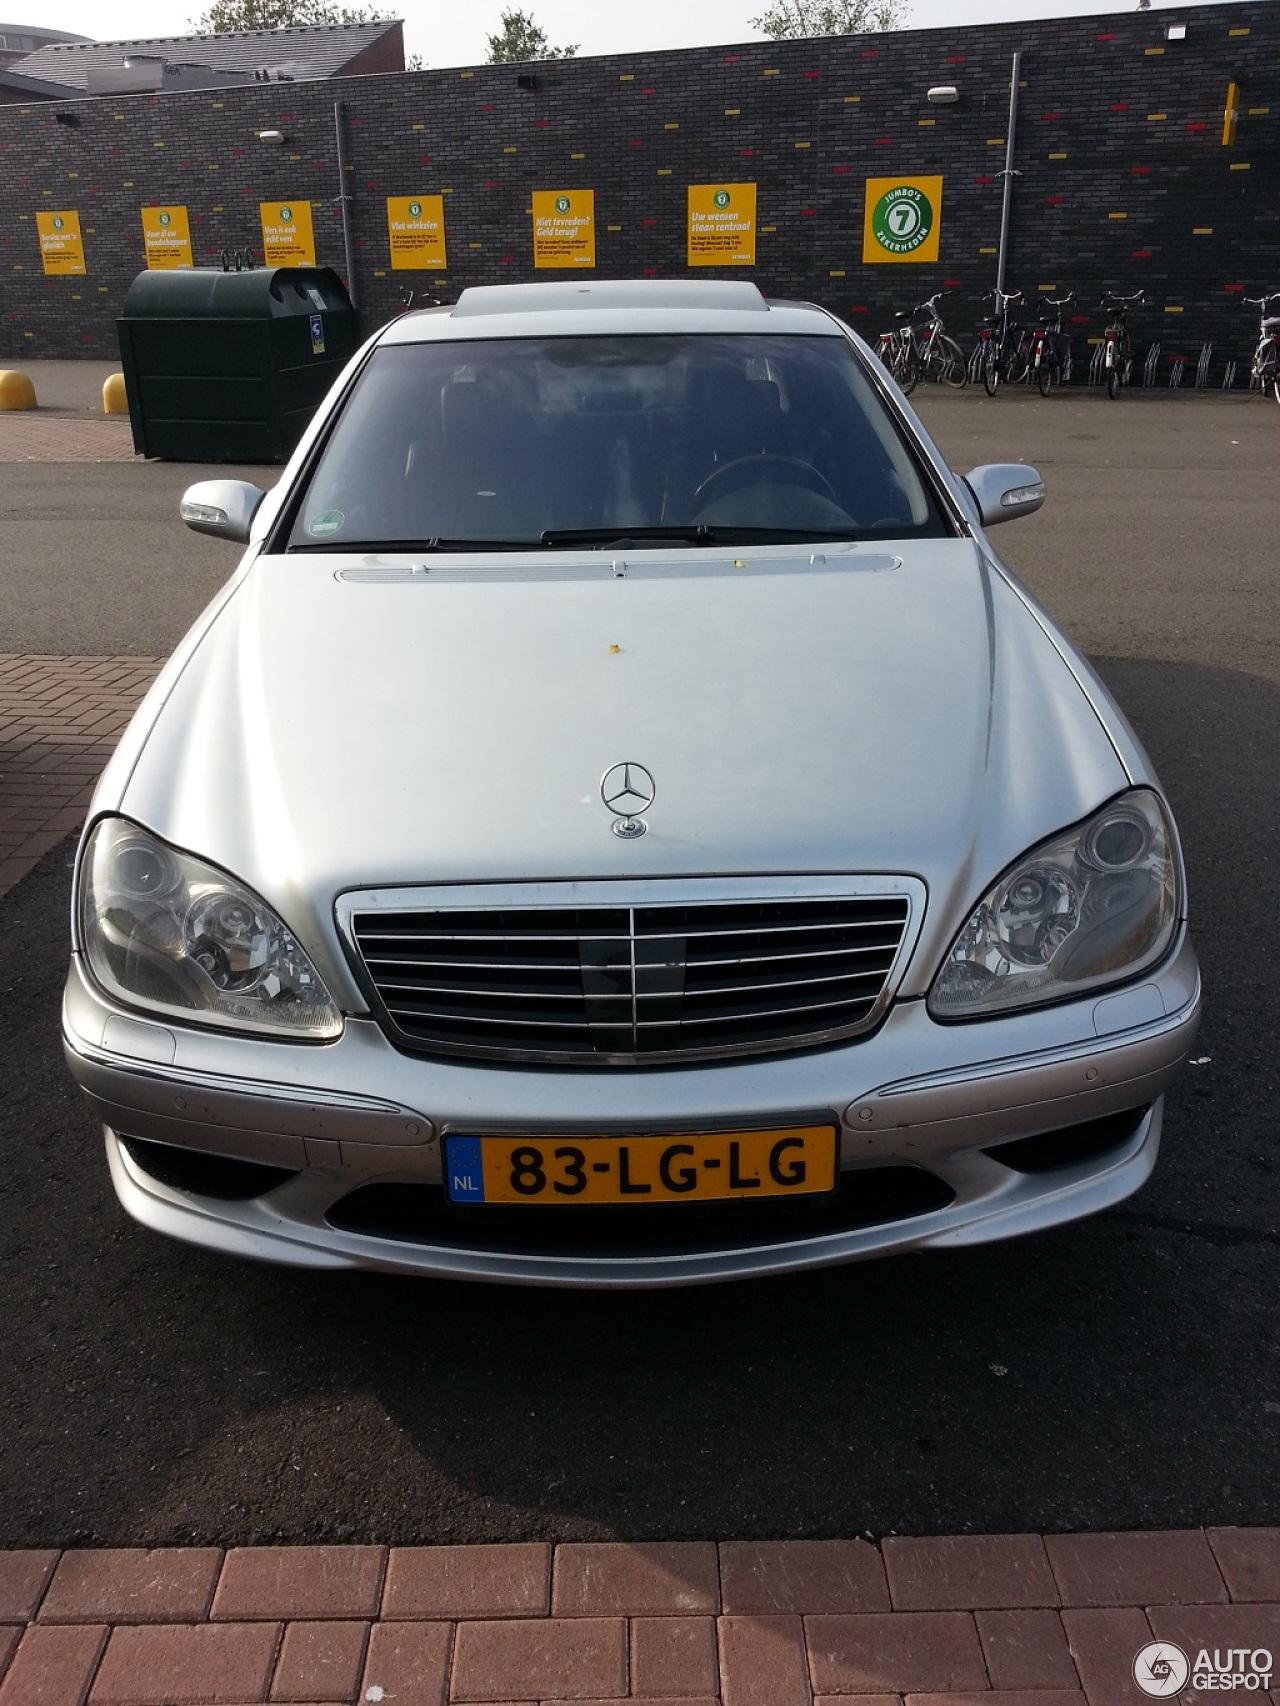 Mercedes benz s 55 amg w220 kompressor 5 oktober 2013 for Mercedes benz amg kompressor